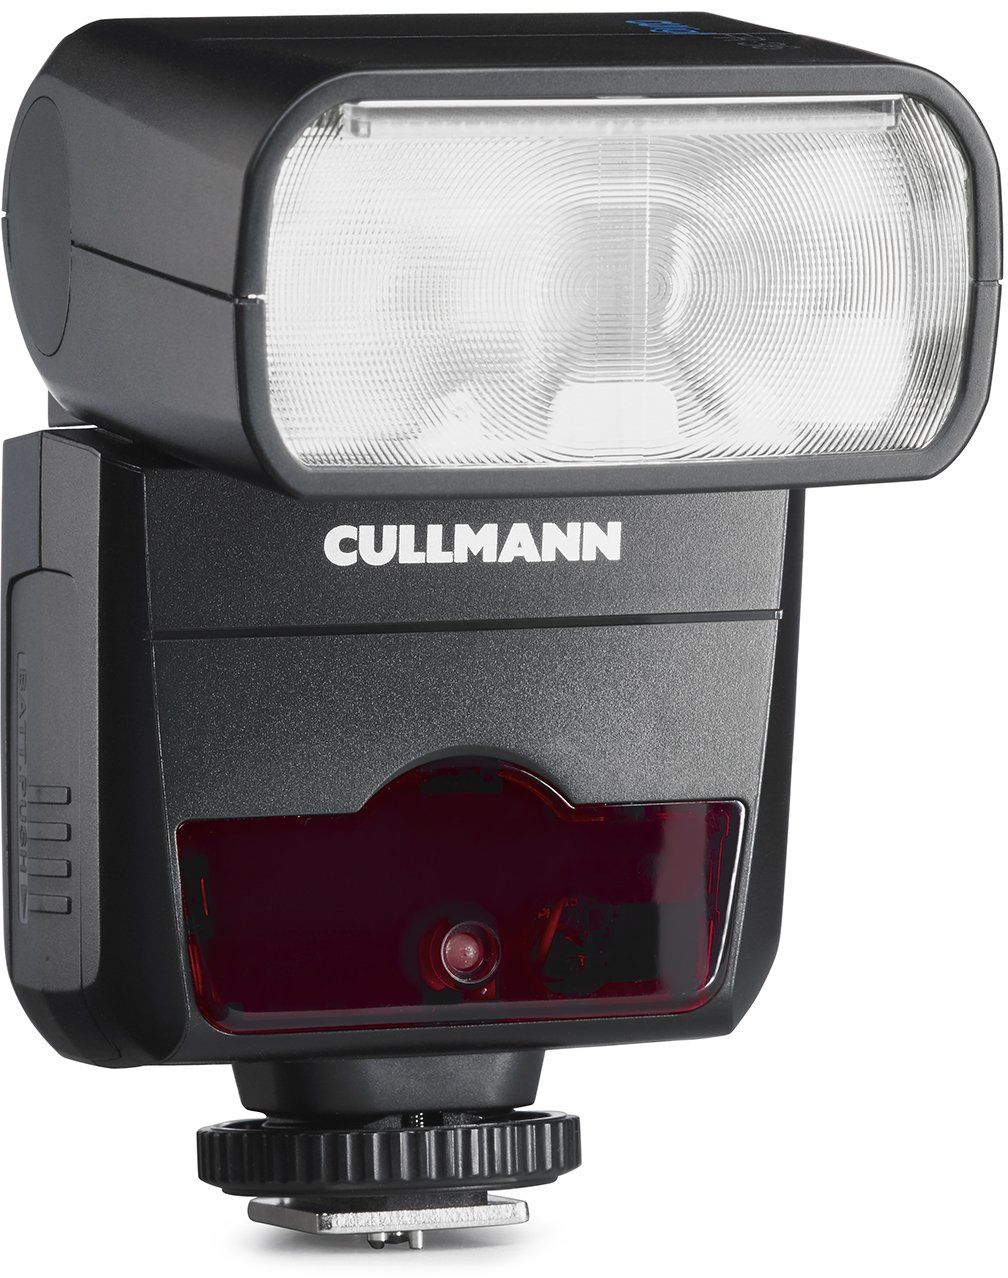 Cullmann 61150 CUlight FR 36F lampa błyskowa do aparatu Fujifilm - czarna